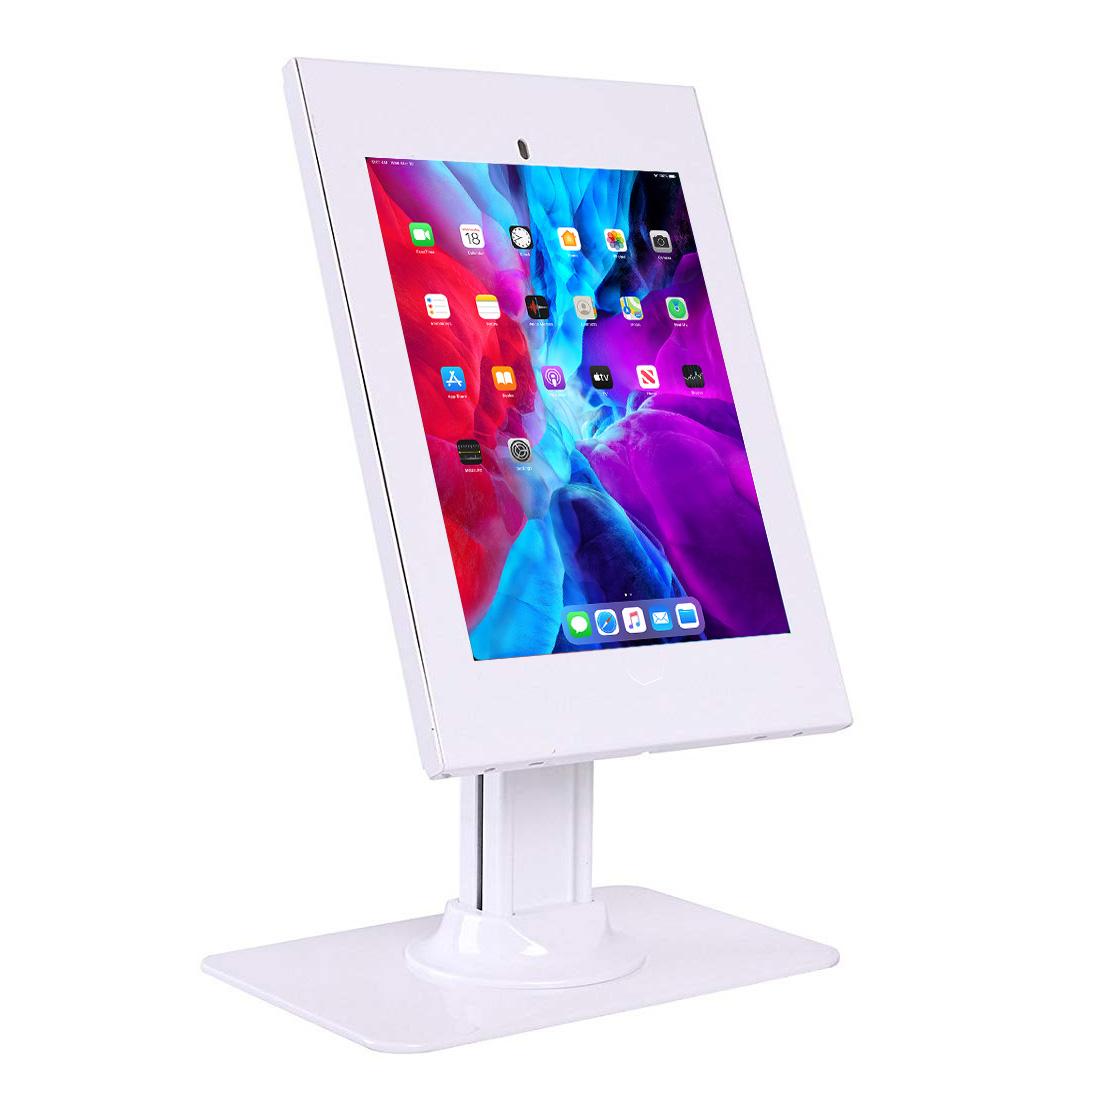 "IPP2602DE 12.9"" iPad Pro (3rd/4th Gen, 2018/2020) Kiosk Security Case Desk Stand White"